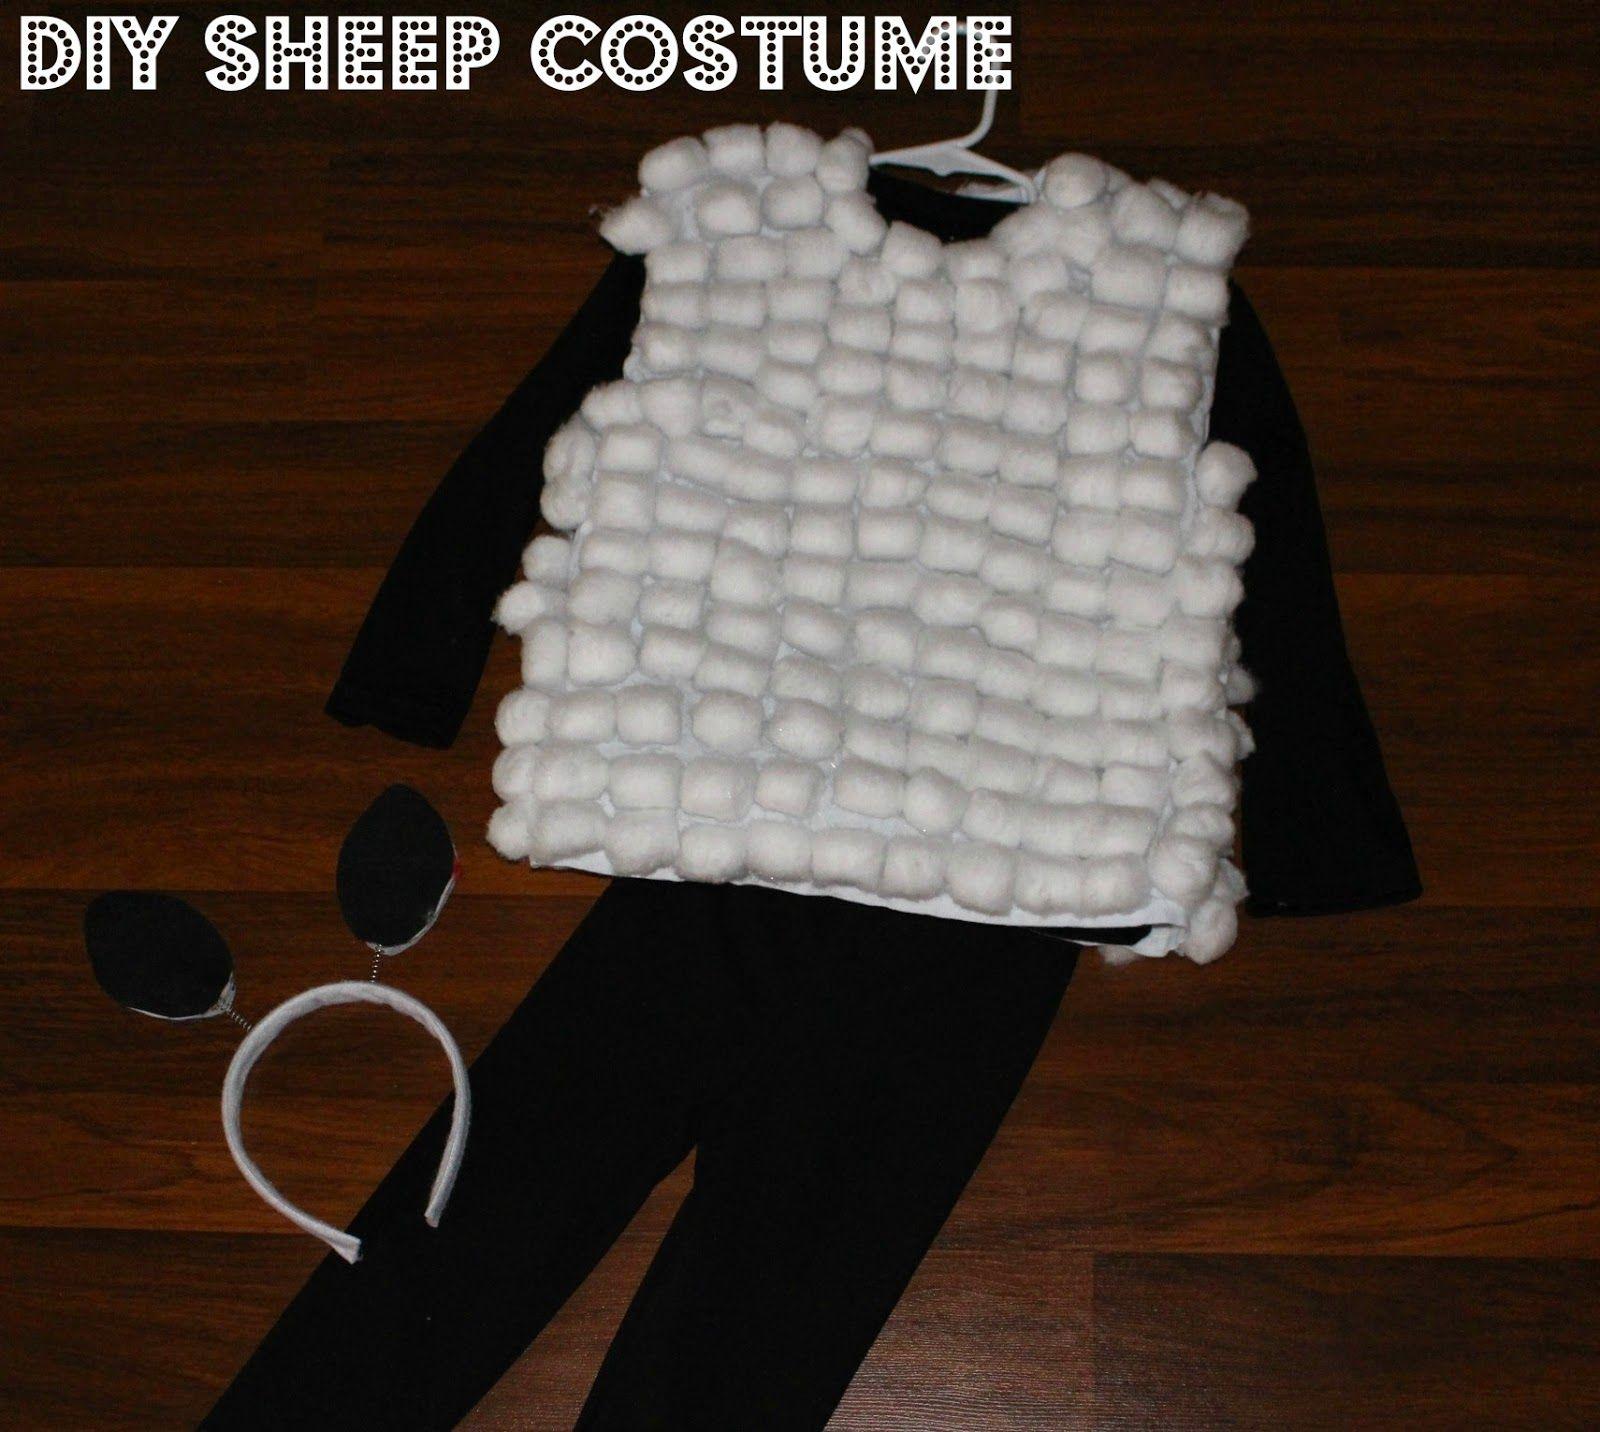 Diy sheep costume httpiheart motherhoodblog201412diy christmas themes diy sheep costume solutioingenieria Choice Image